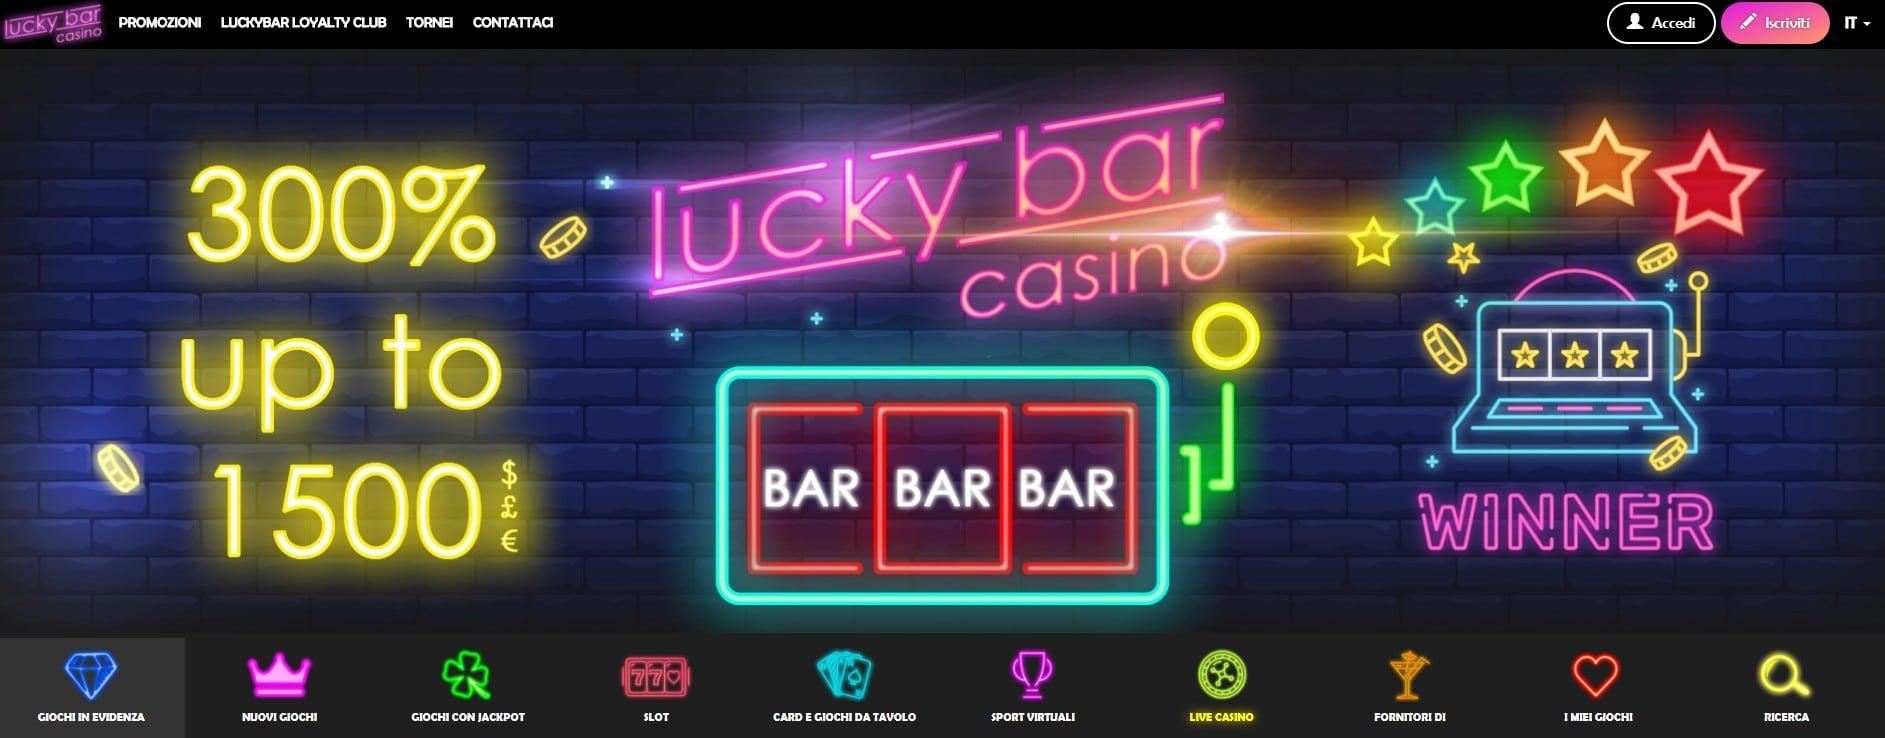 Lucky Bar Casino